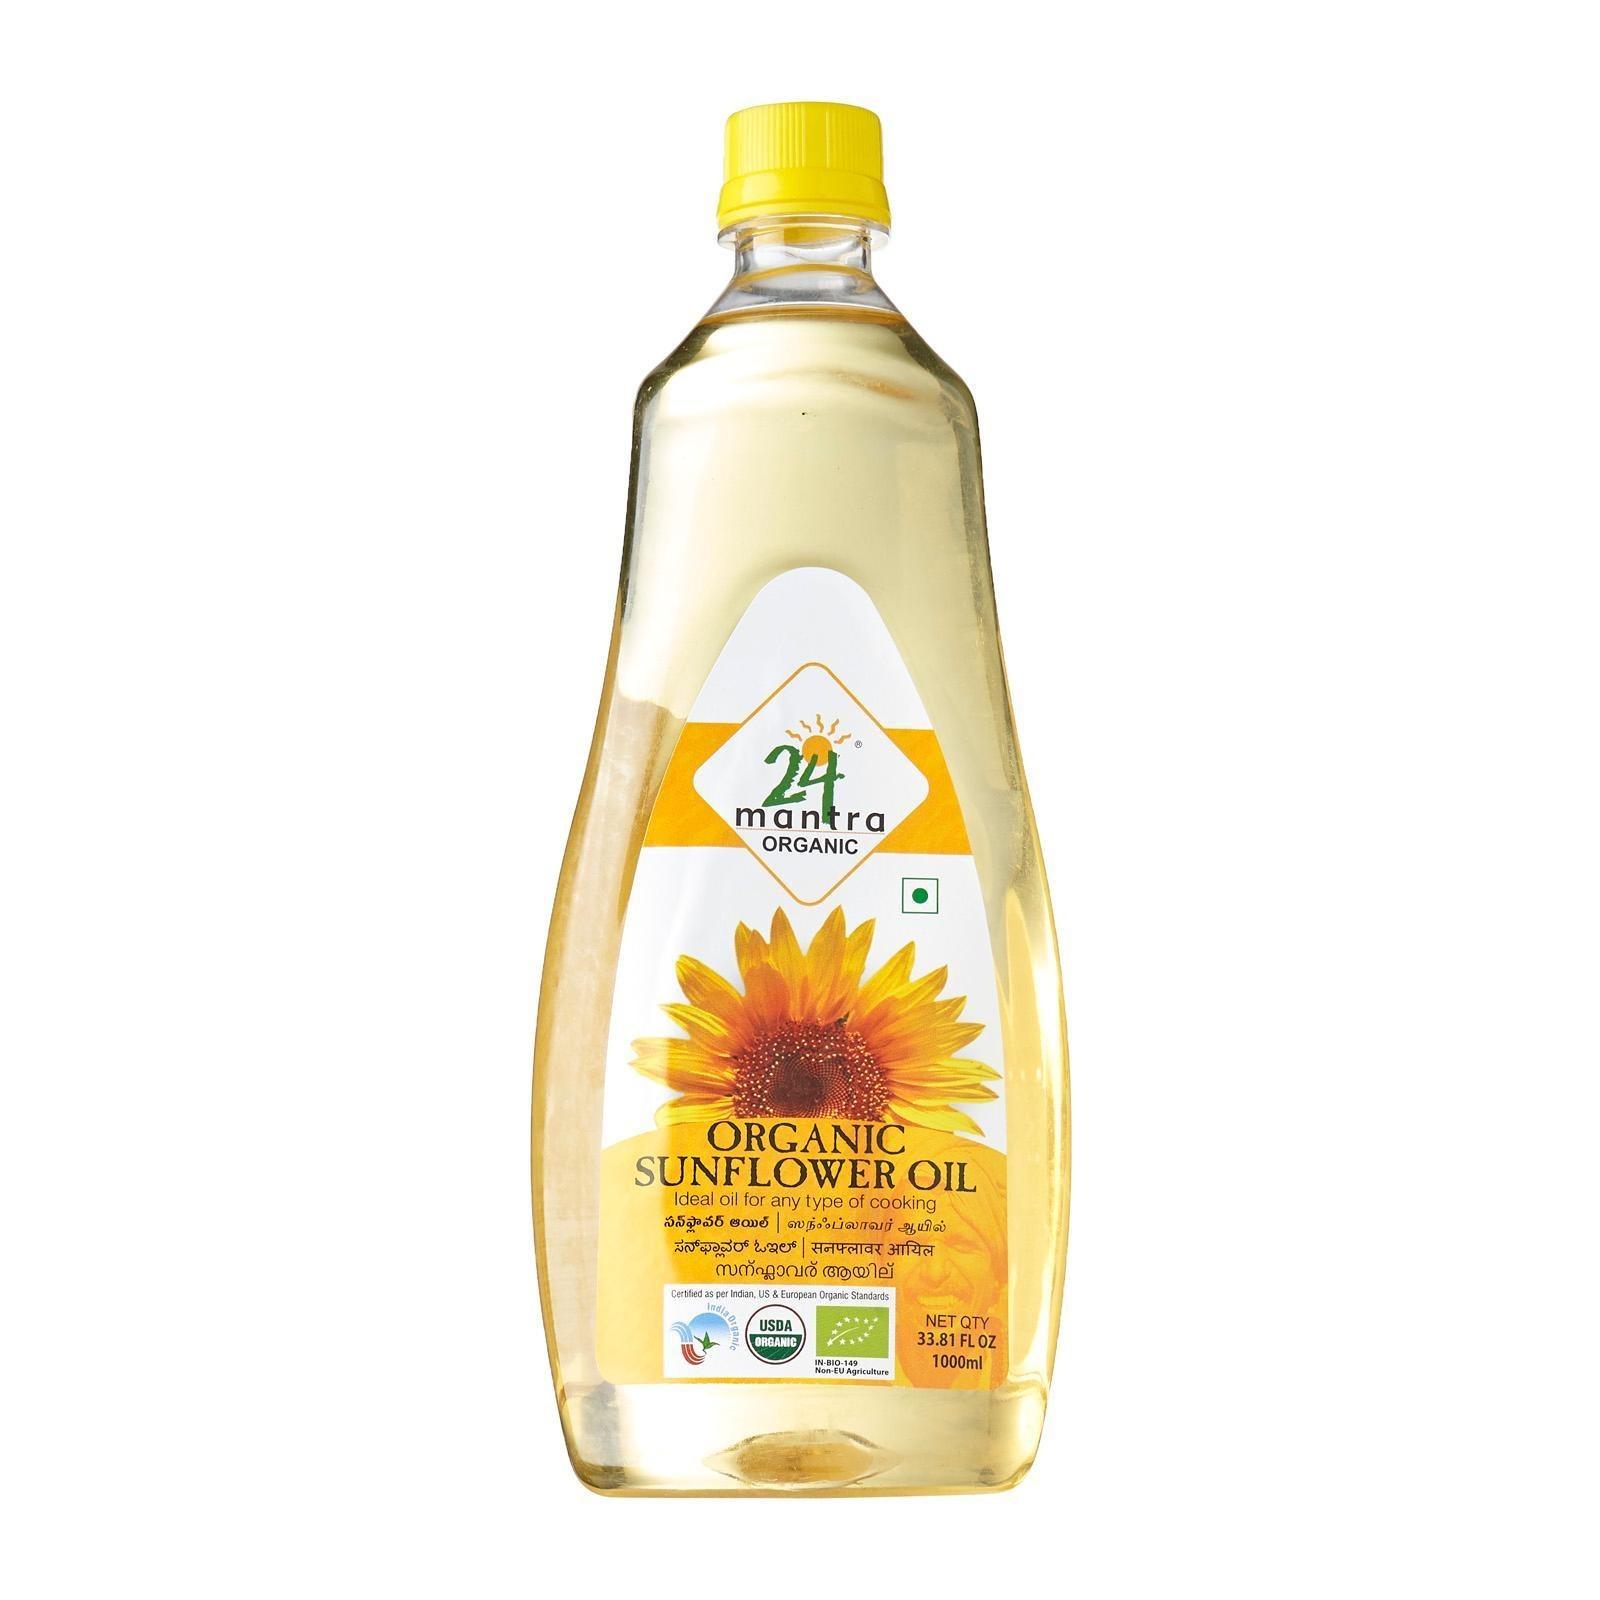 24 Mantra Organic - Sunflower Oil